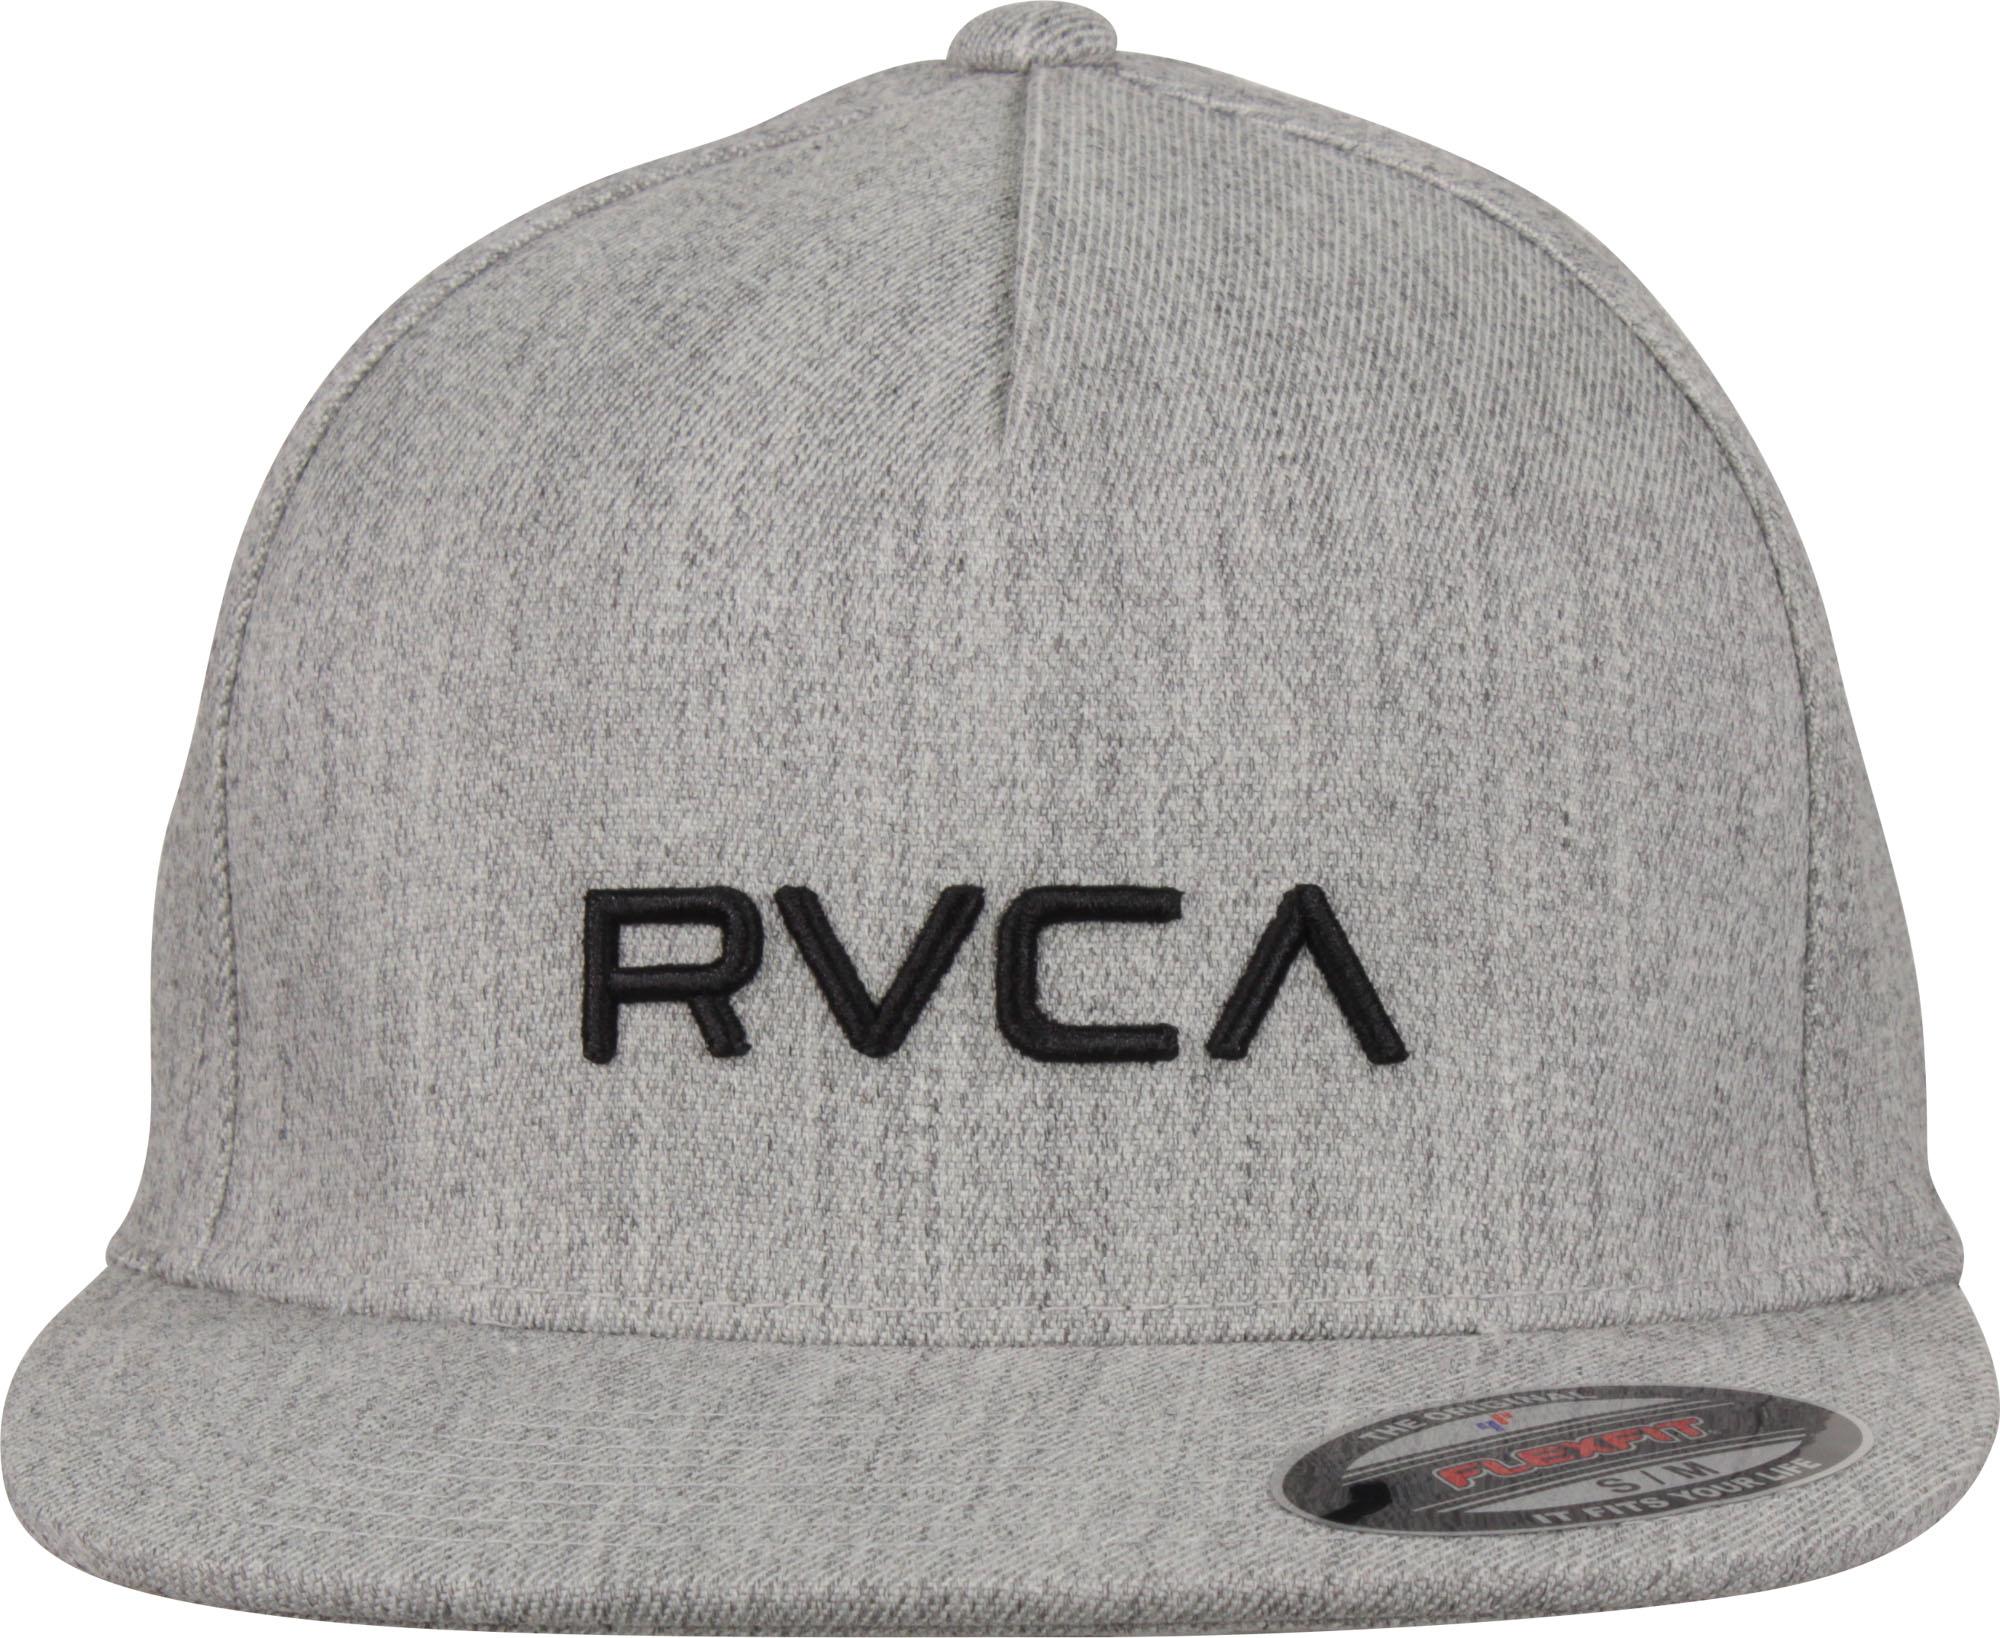 Details about RVCA Mens VA Sport Flexfit Hat - Heather Gray 6b978711570